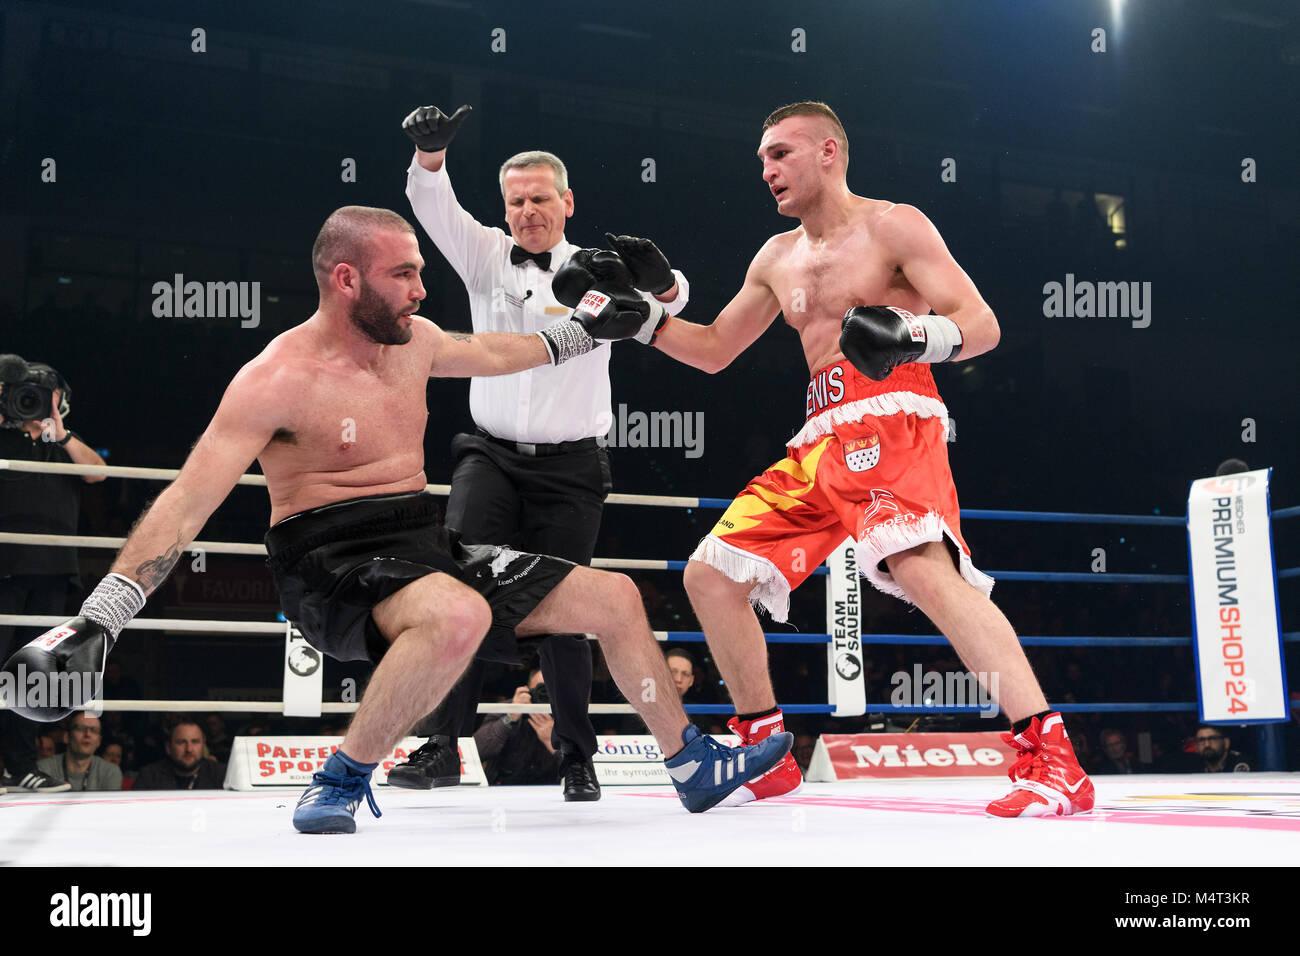 Ludwigsburg, Deutschland. 17th Feb, 2018. Radovan schlaegt Scaccia K.O. GES/ Boxen/ Super Middleweight: Denis Radovan - Stock Image